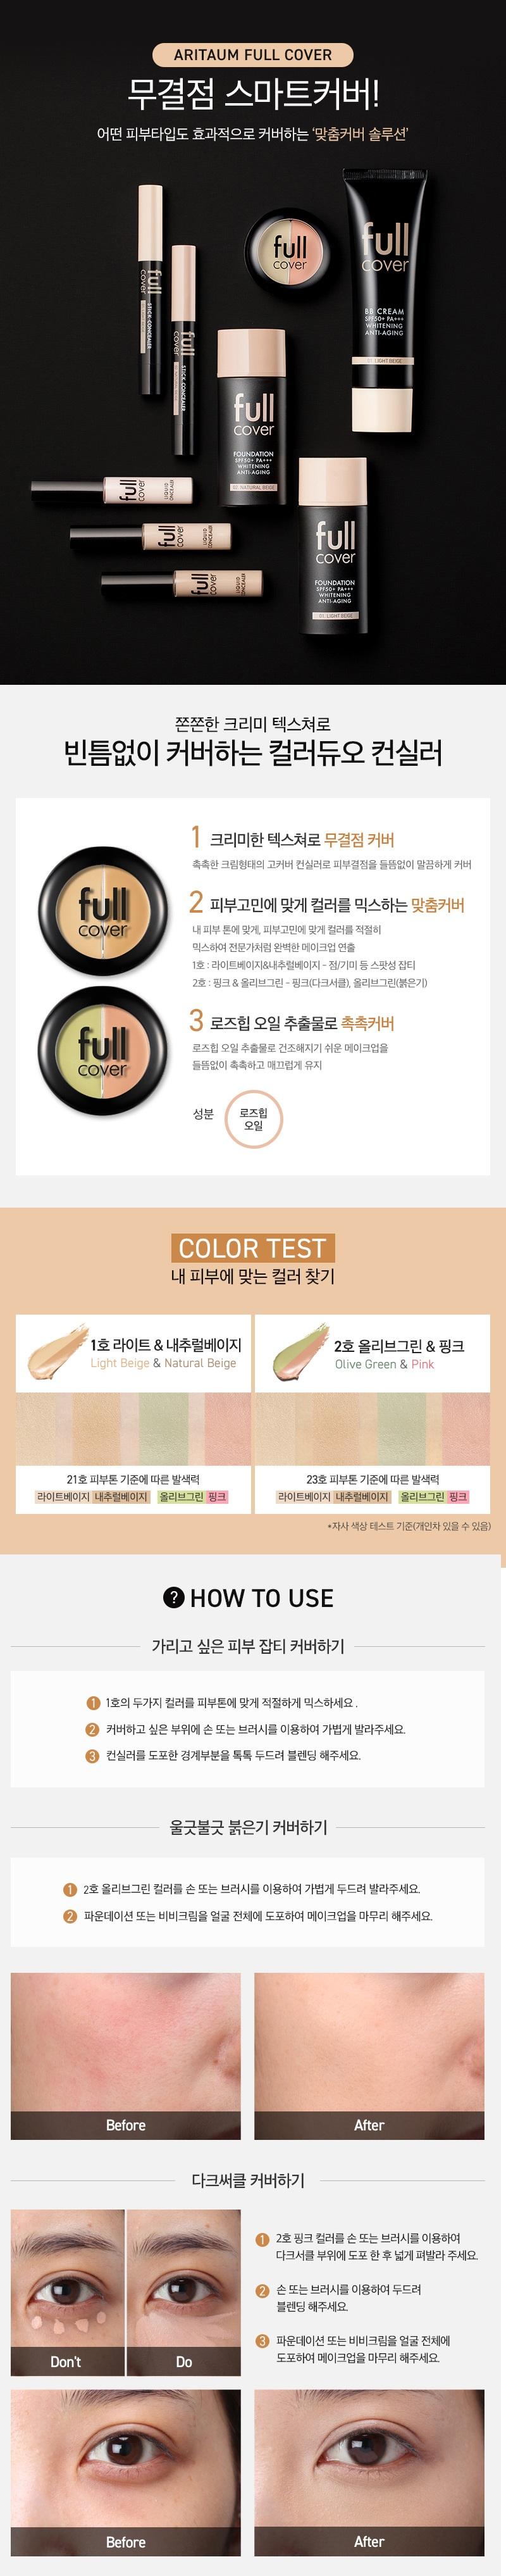 ARITAUM Full Cover Cream Concealer korean cosmetic makeup product online shop malaysia setia alam shah alam 1